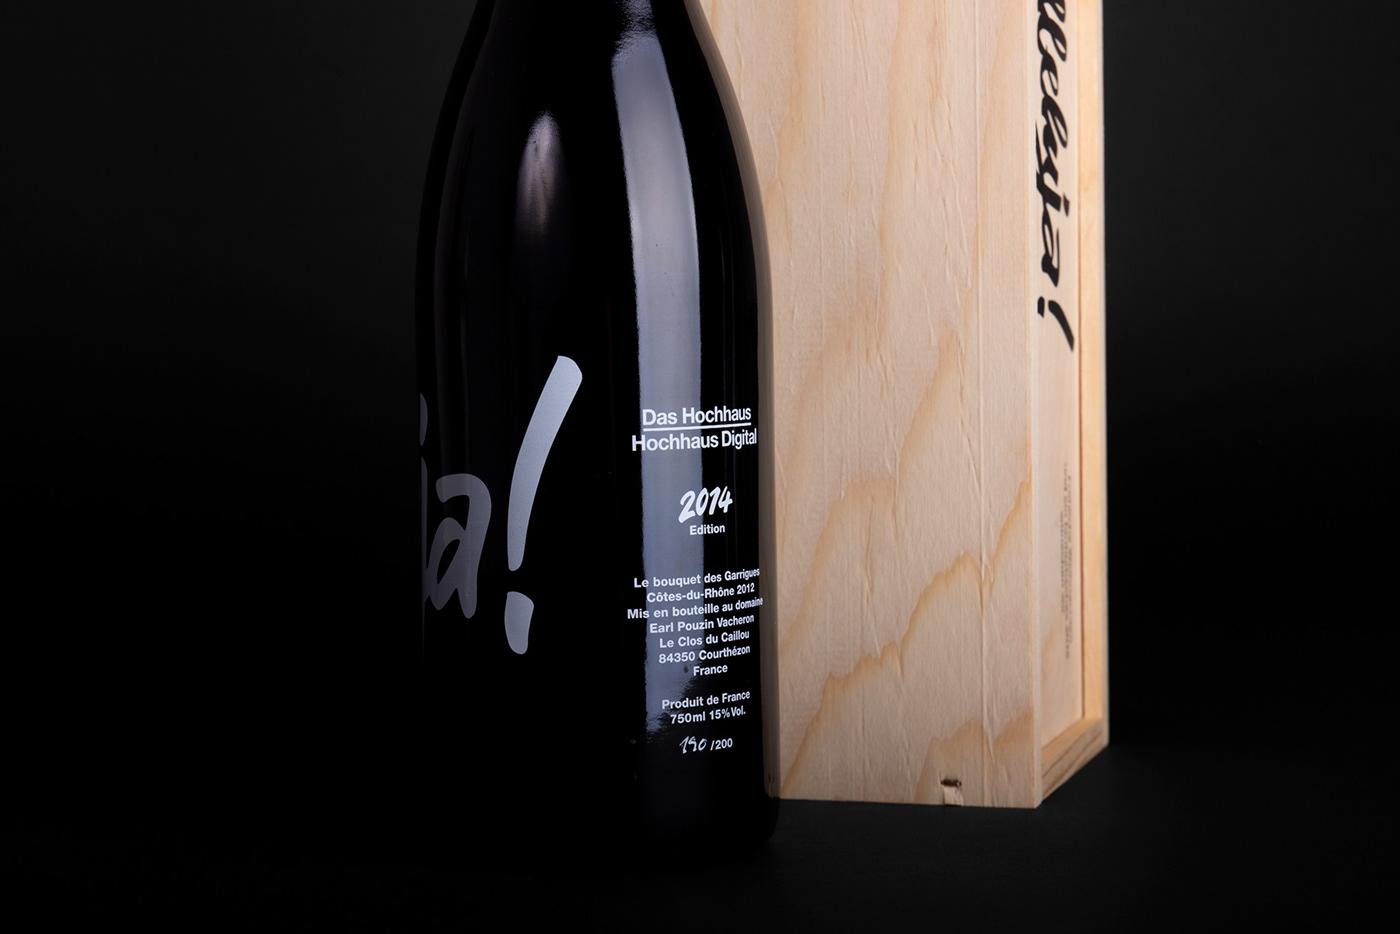 blackandwhite bottle Handlettering lettering Packaging type wine screenprint beverages winebottle